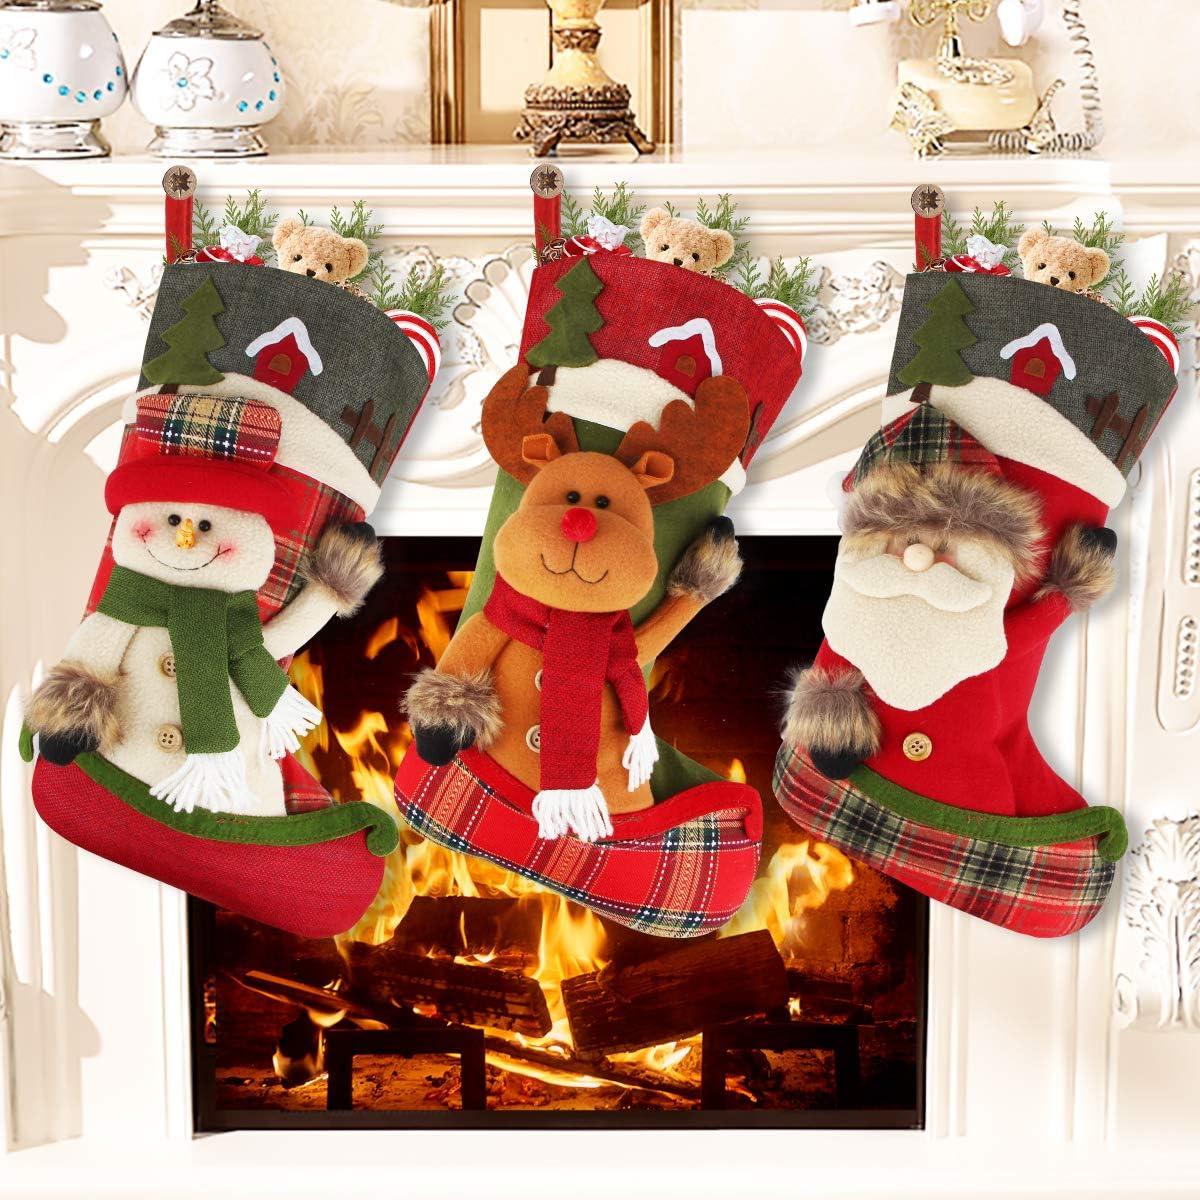 Aiduy Set of 3 Christmas Stockings Decoration with Cute 3D Plush Santa Snowman Reindeer Xmas Stockings for Christmas Tree Decorations Gifts and Home Decor, 18''